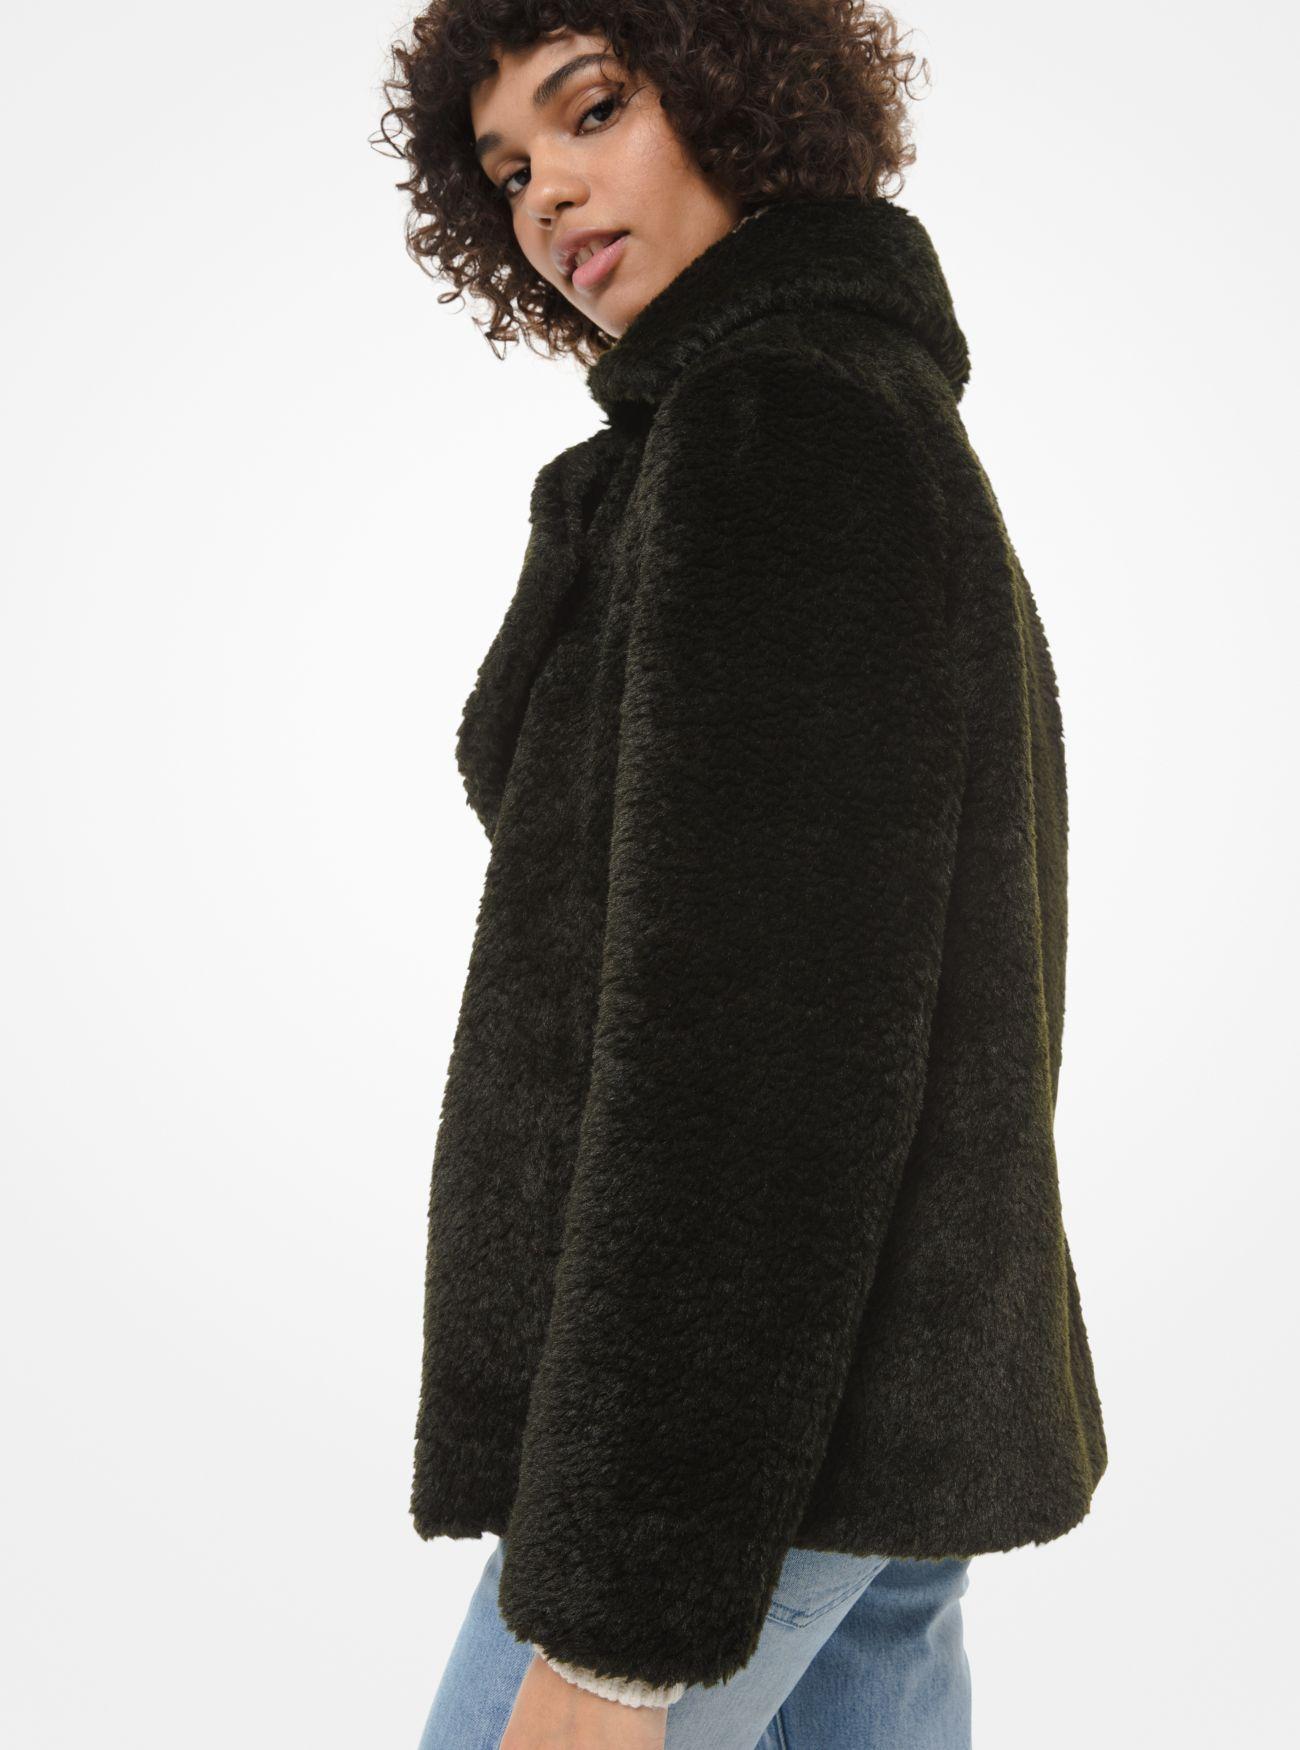 Michael Kors Denim Faux Fur Jacket in Green - Lyst